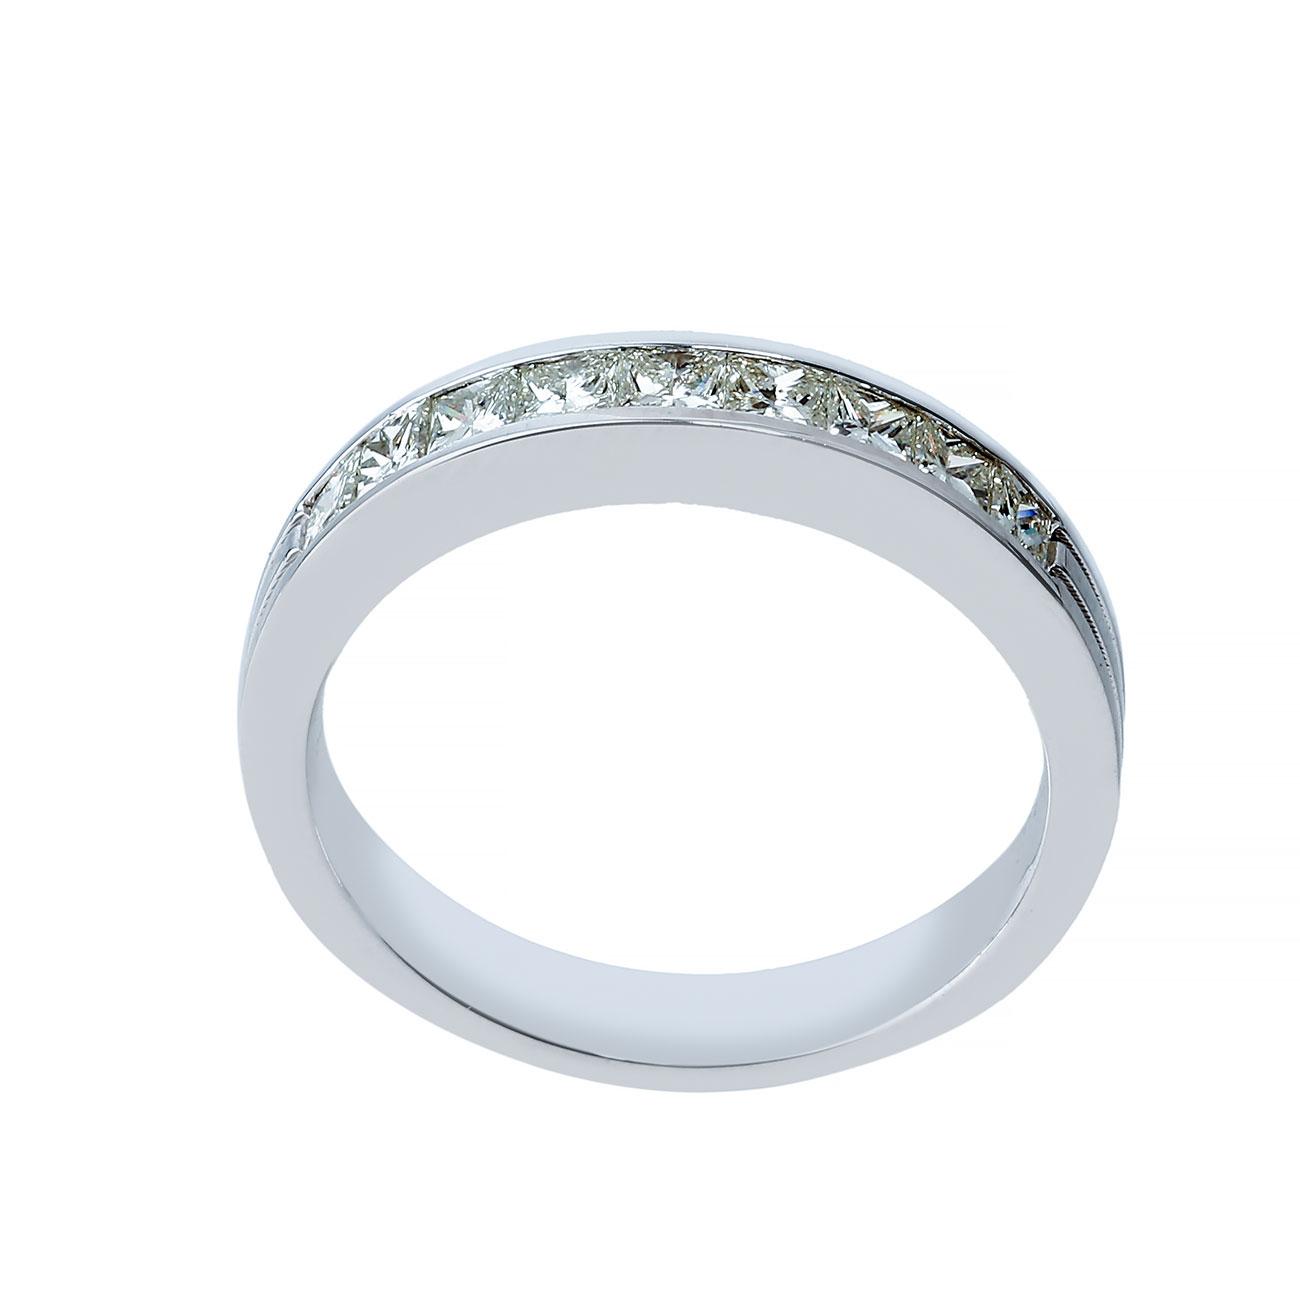 حلقه برليان 79157 C گوهربين goharbin